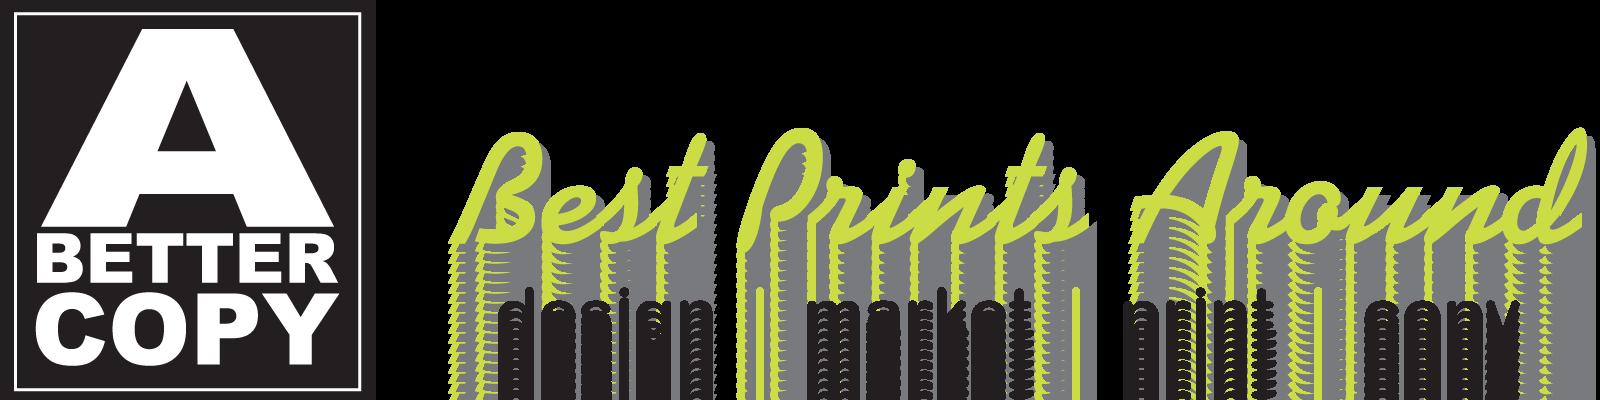 A_Better_Copy_Best_Print_around